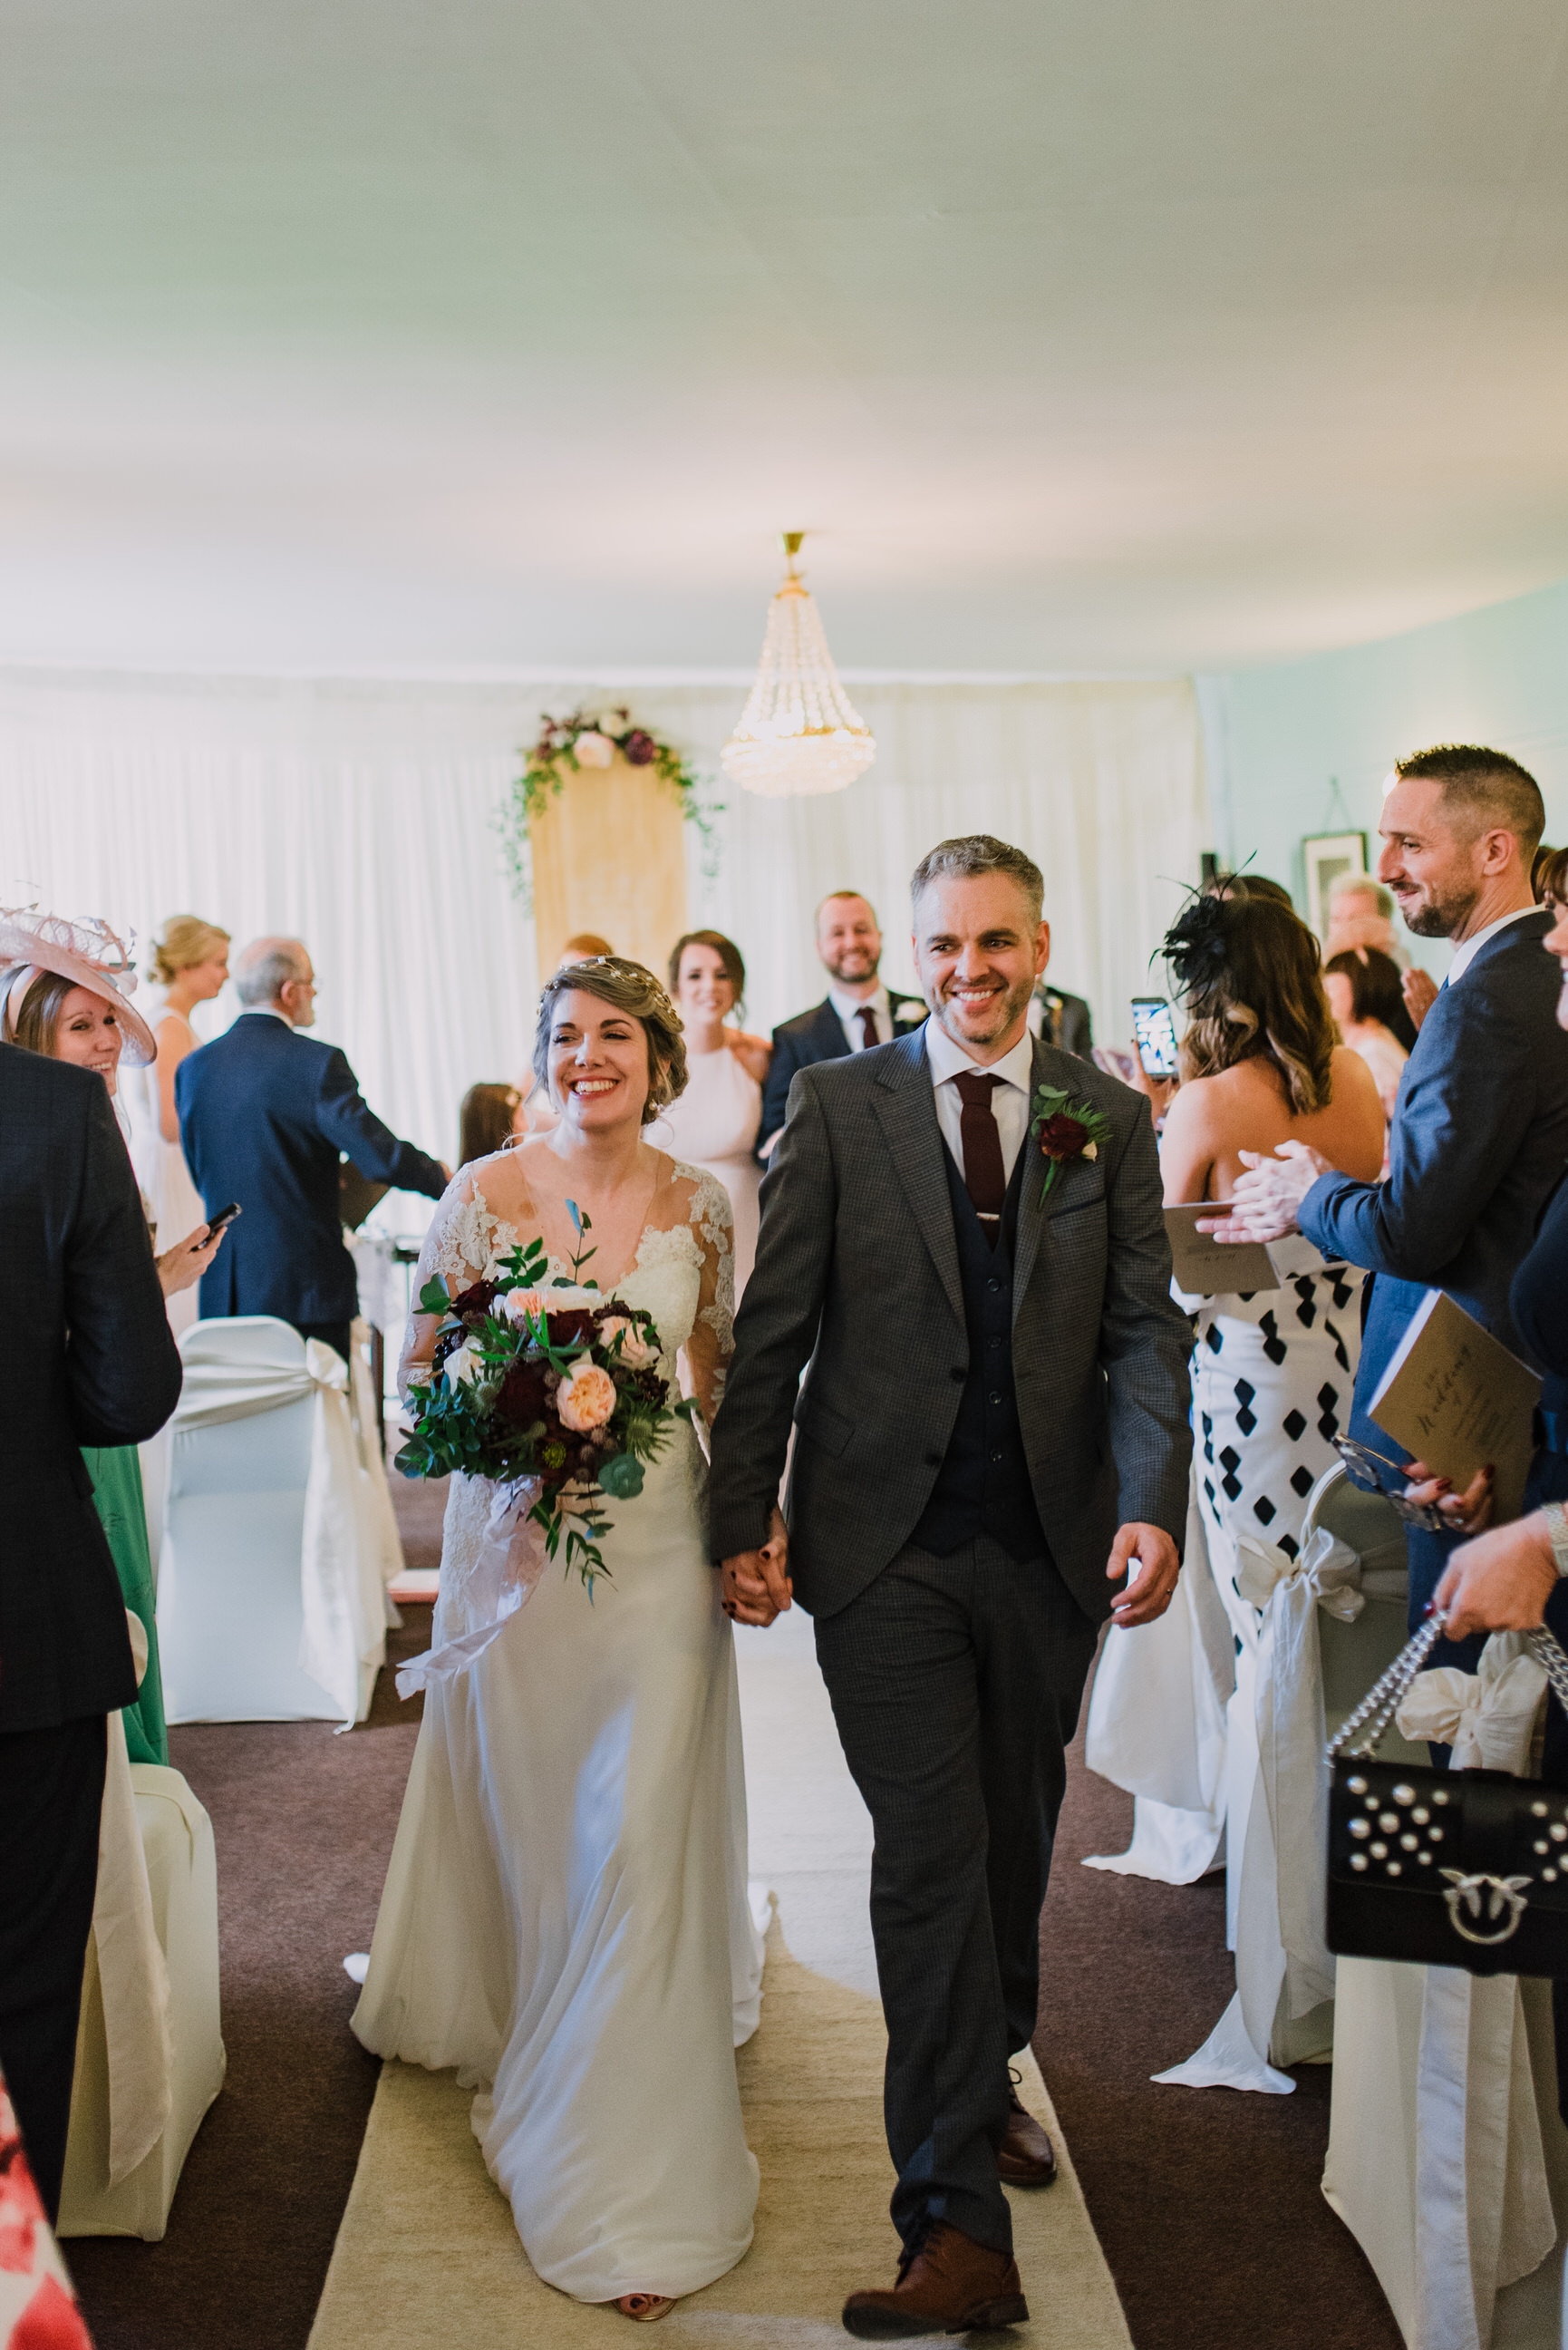 lissanoure castle wedding, northern ireland wedding photographer, romantic northern irish wedding venue, castle wedding ireland, natural wedding photography ni (66).jpg